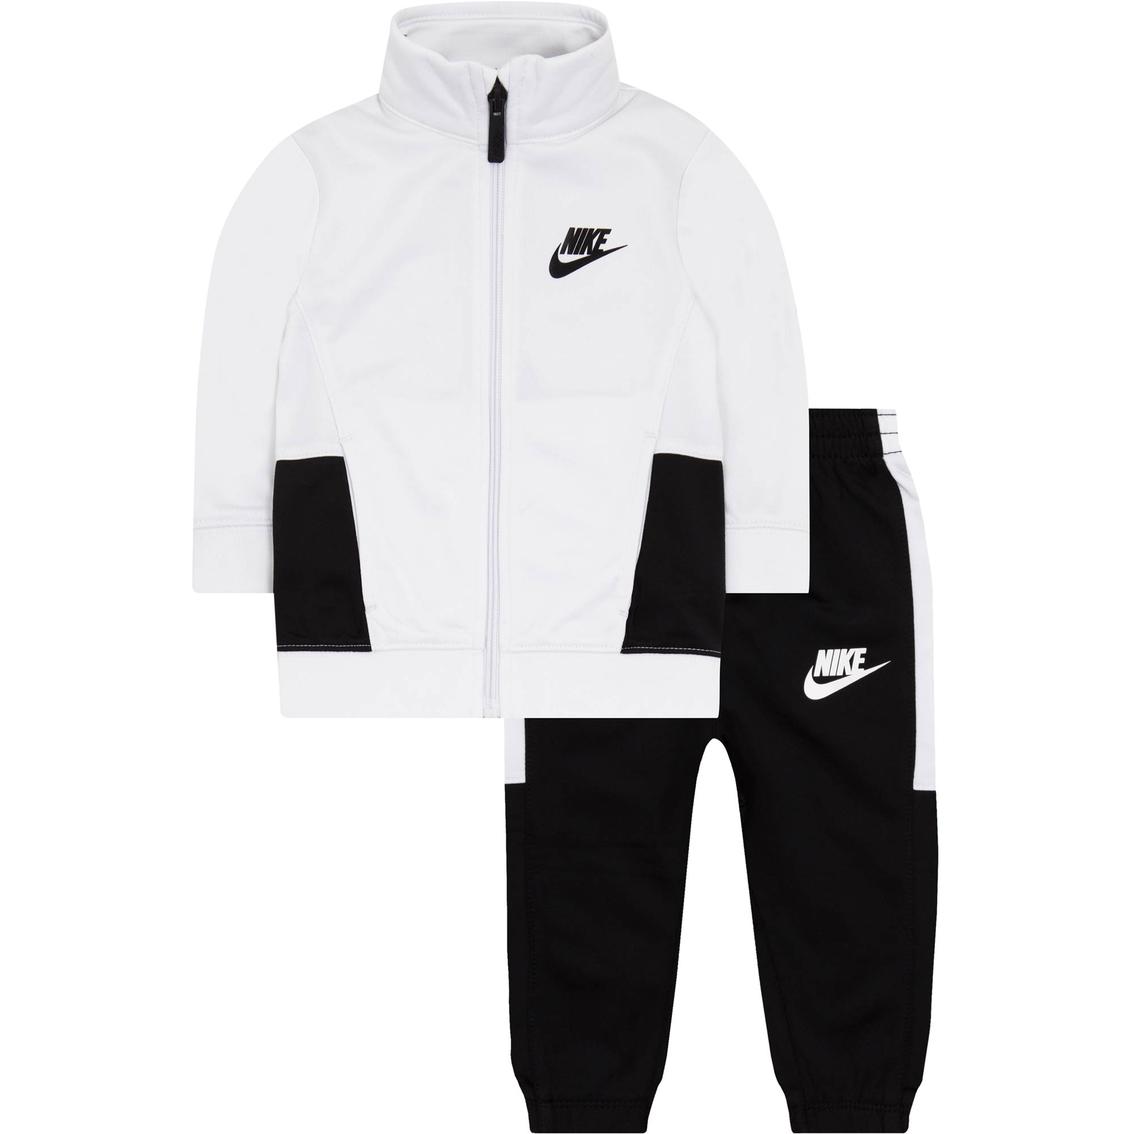 27f160d06071da Nike Toddler Boys Futura Tricot 2 Pc. Set   Toddler Boys 2t-4t ...